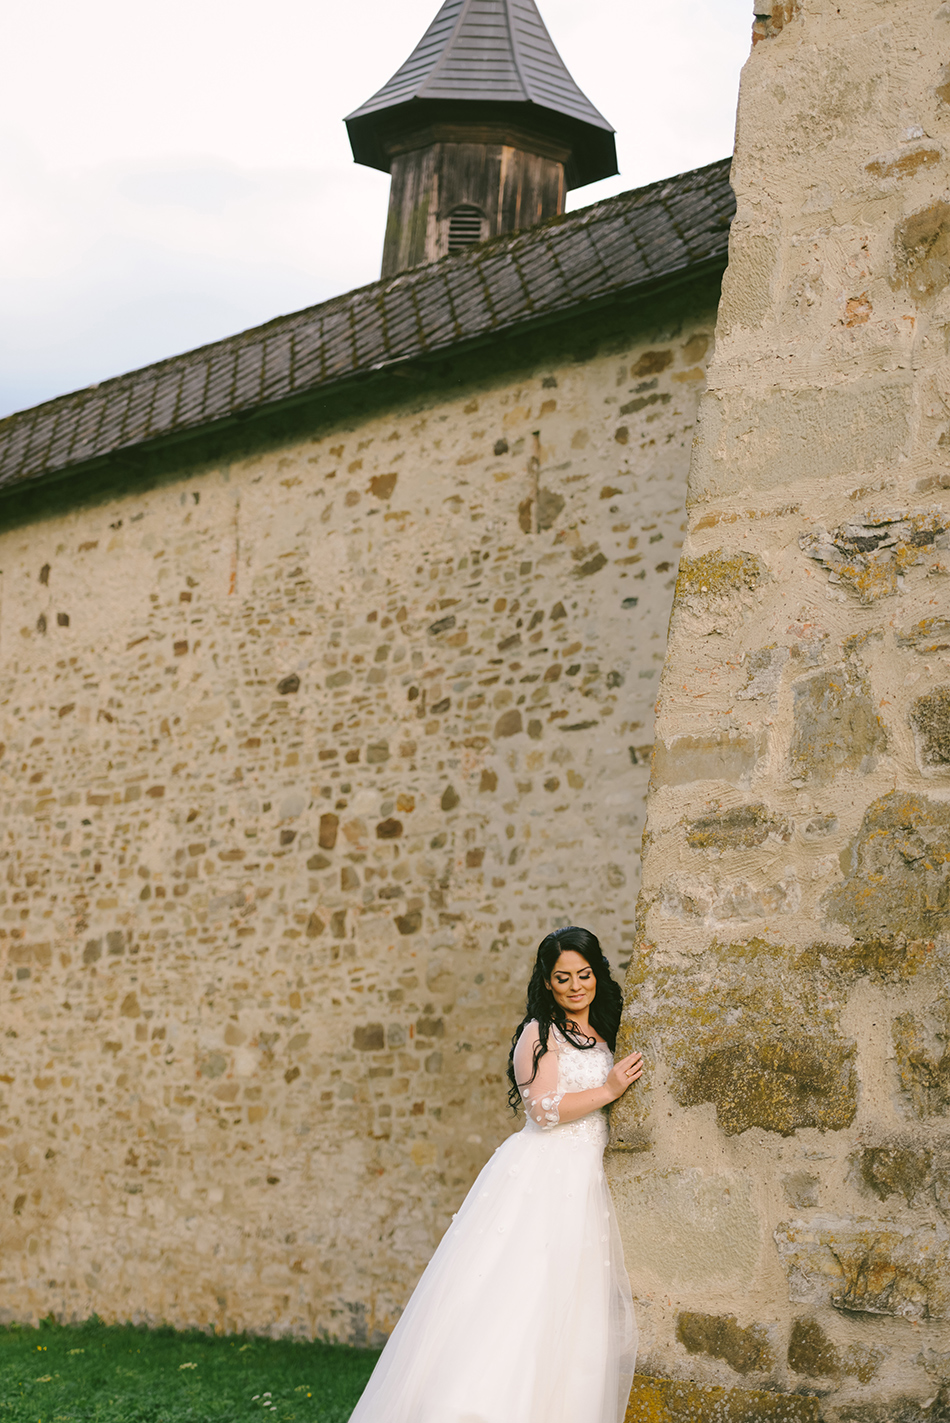 AD Passion Photography | ad-passion_diana-si-gabi_fotograf-nunta-suceava_0077 | Adelin, Dida, fotograf profesionist, fotograf de nunta, fotografie de nunta, fotograf Timisoara, fotograf Craiova, fotograf Bucuresti, fotograf Arad, nunta Timisoara, nunta Arad, nunta Bucuresti, nunta Craiova